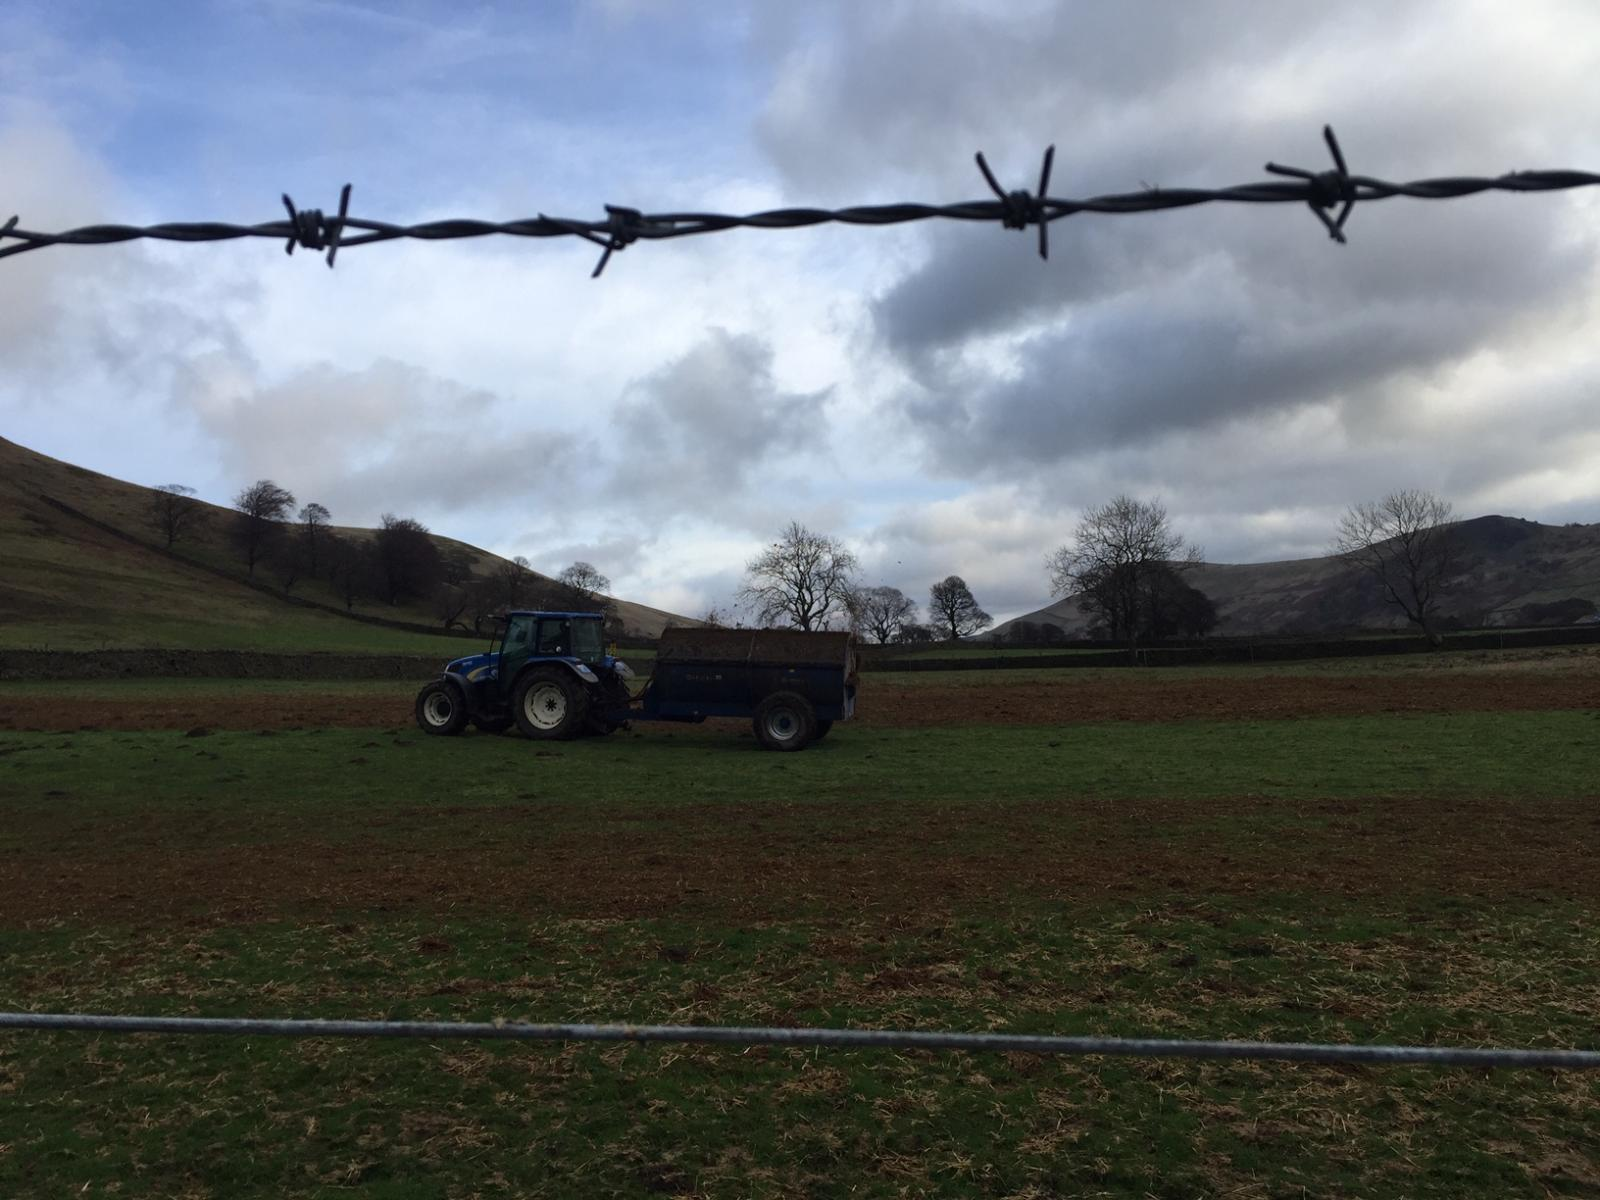 Farmland scene, Derbyshire. Photo credit: Kath Dalmeny